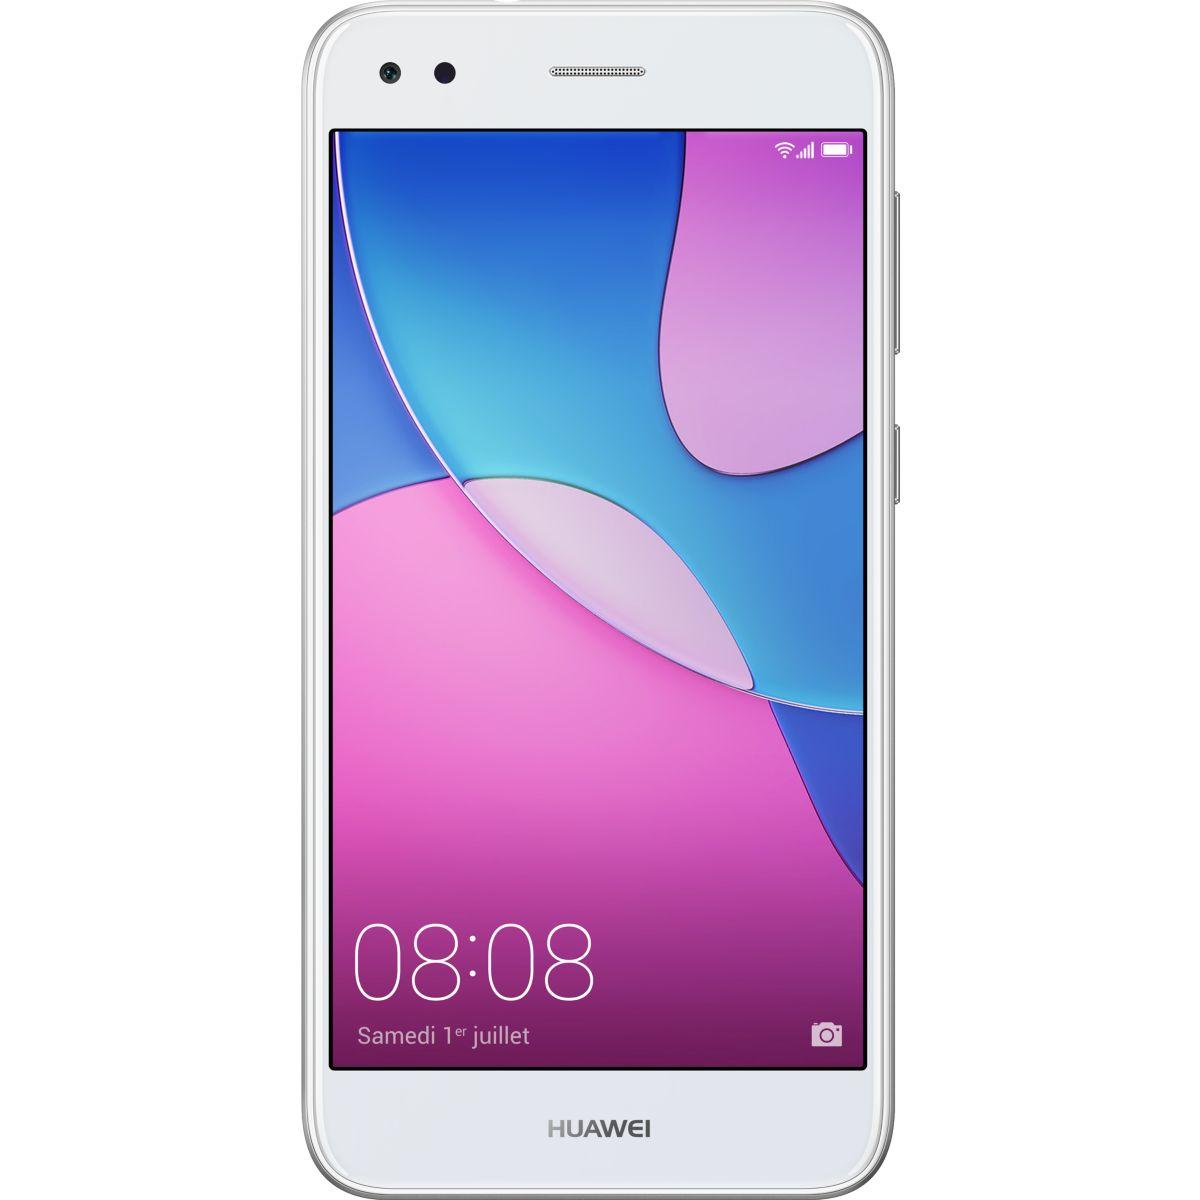 Smartphone huawei y6 pro silver blanc - 2% de remise imm�diate avec le code : green2